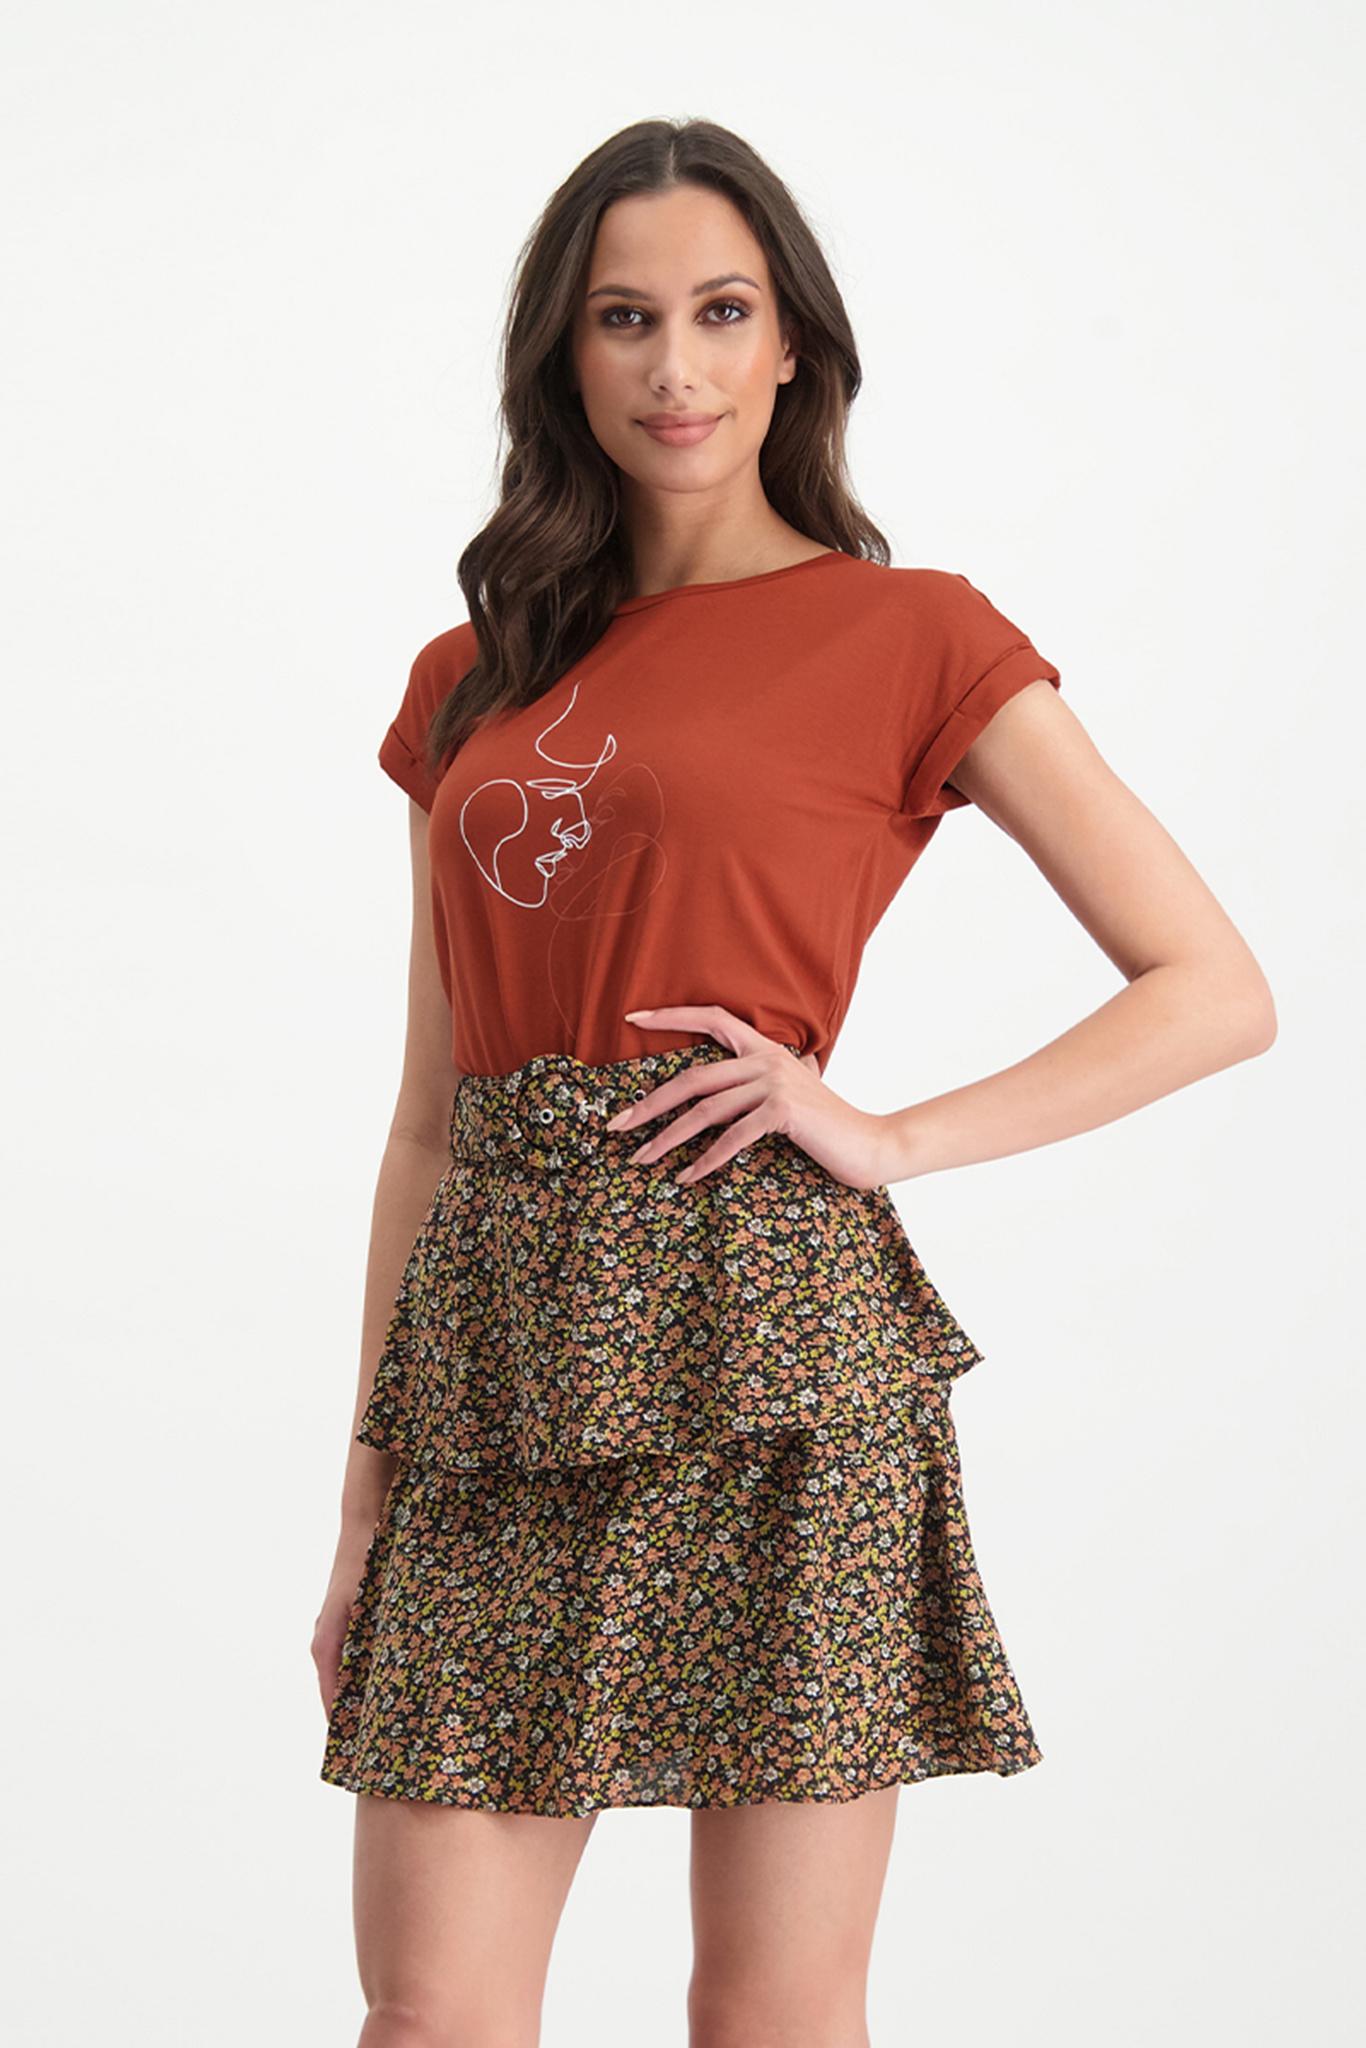 Lofty Manner Roestbruin T-shirt Zoe